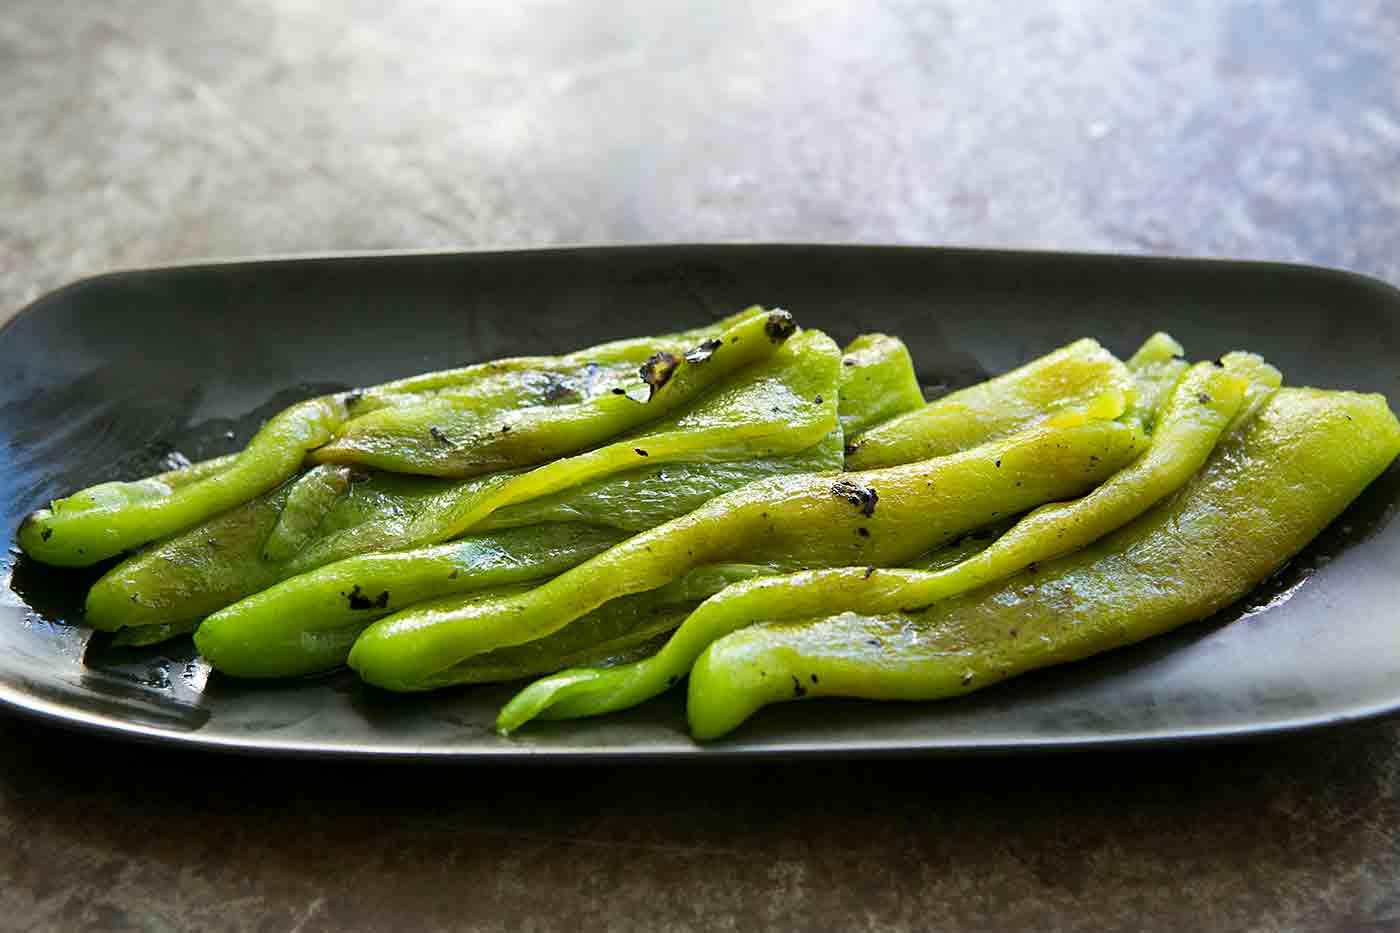 Roasted Green Chiles in a Light Vinaigrette